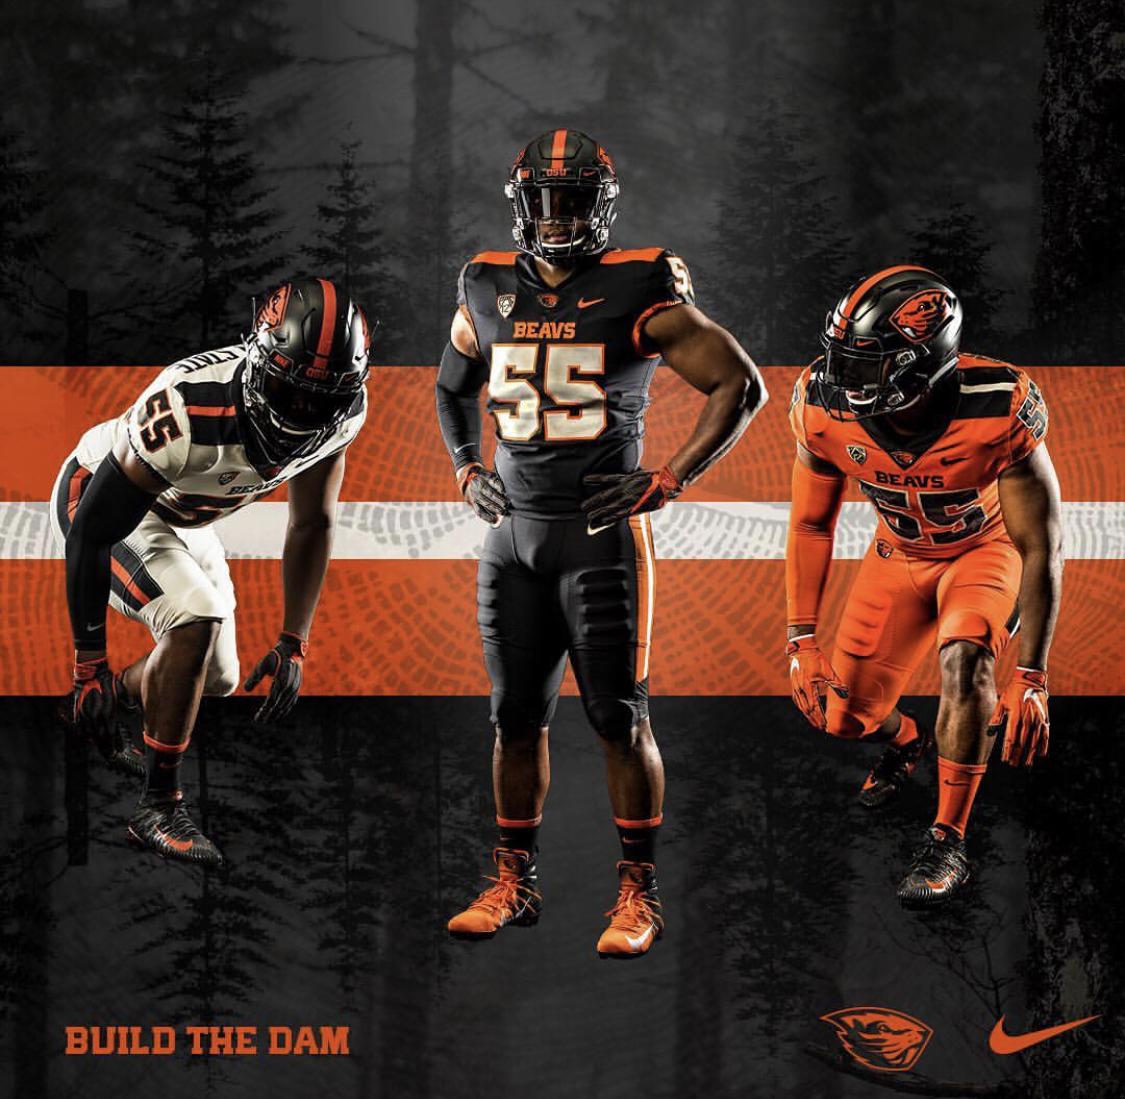 wholesale dealer 50db5 b588e New Uniforms for Oregon State — UNISWAG